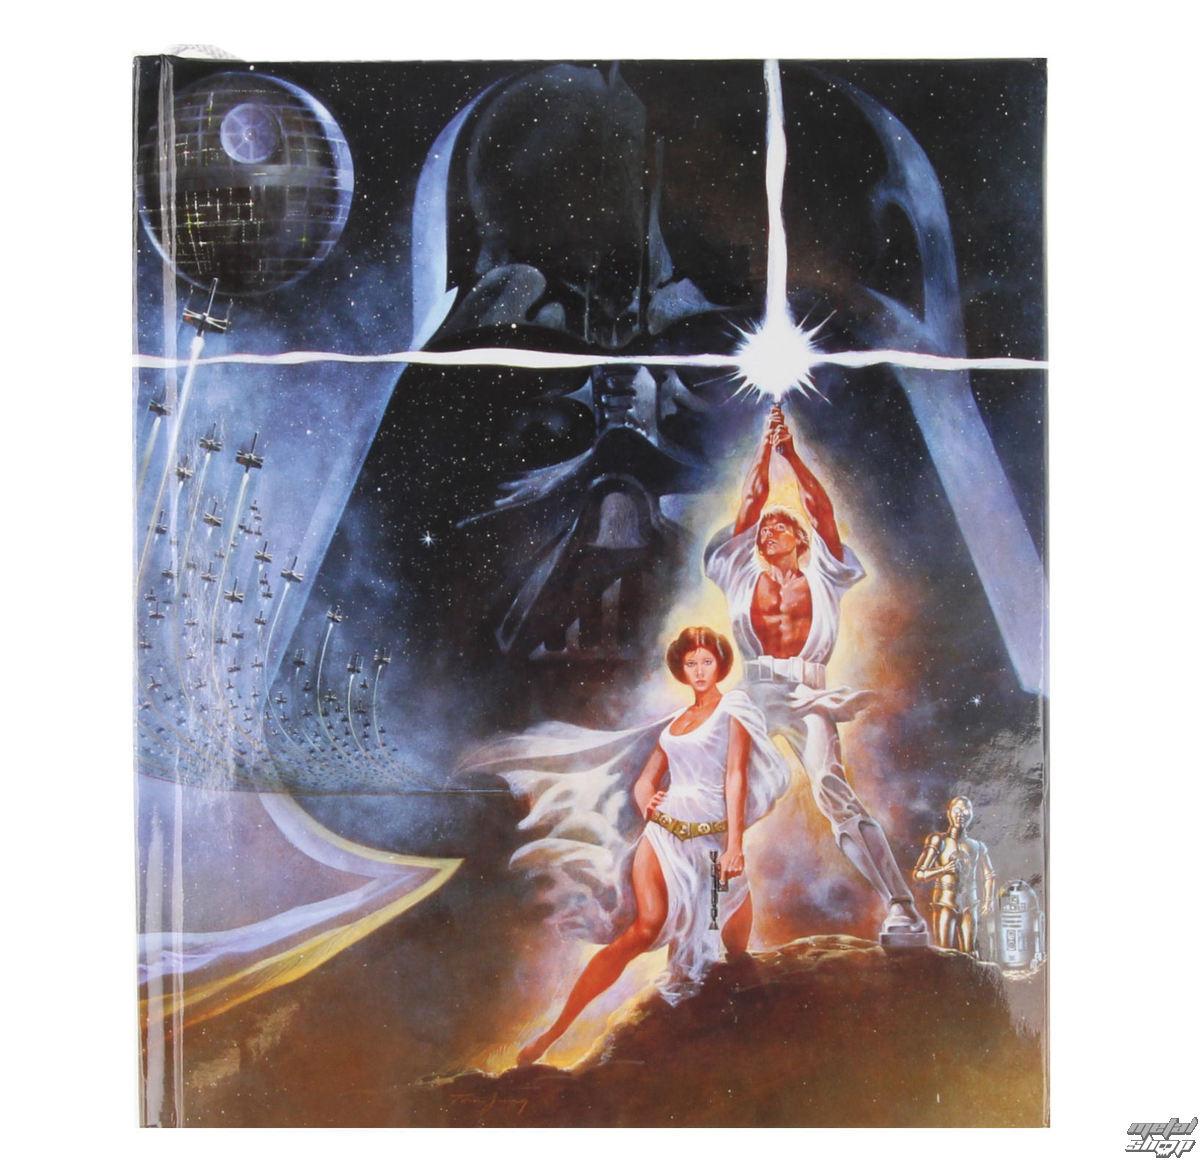 poznámkový blok STAR WARS - DARTH VADER - LOW FREQUENCY - SDTSDT27015